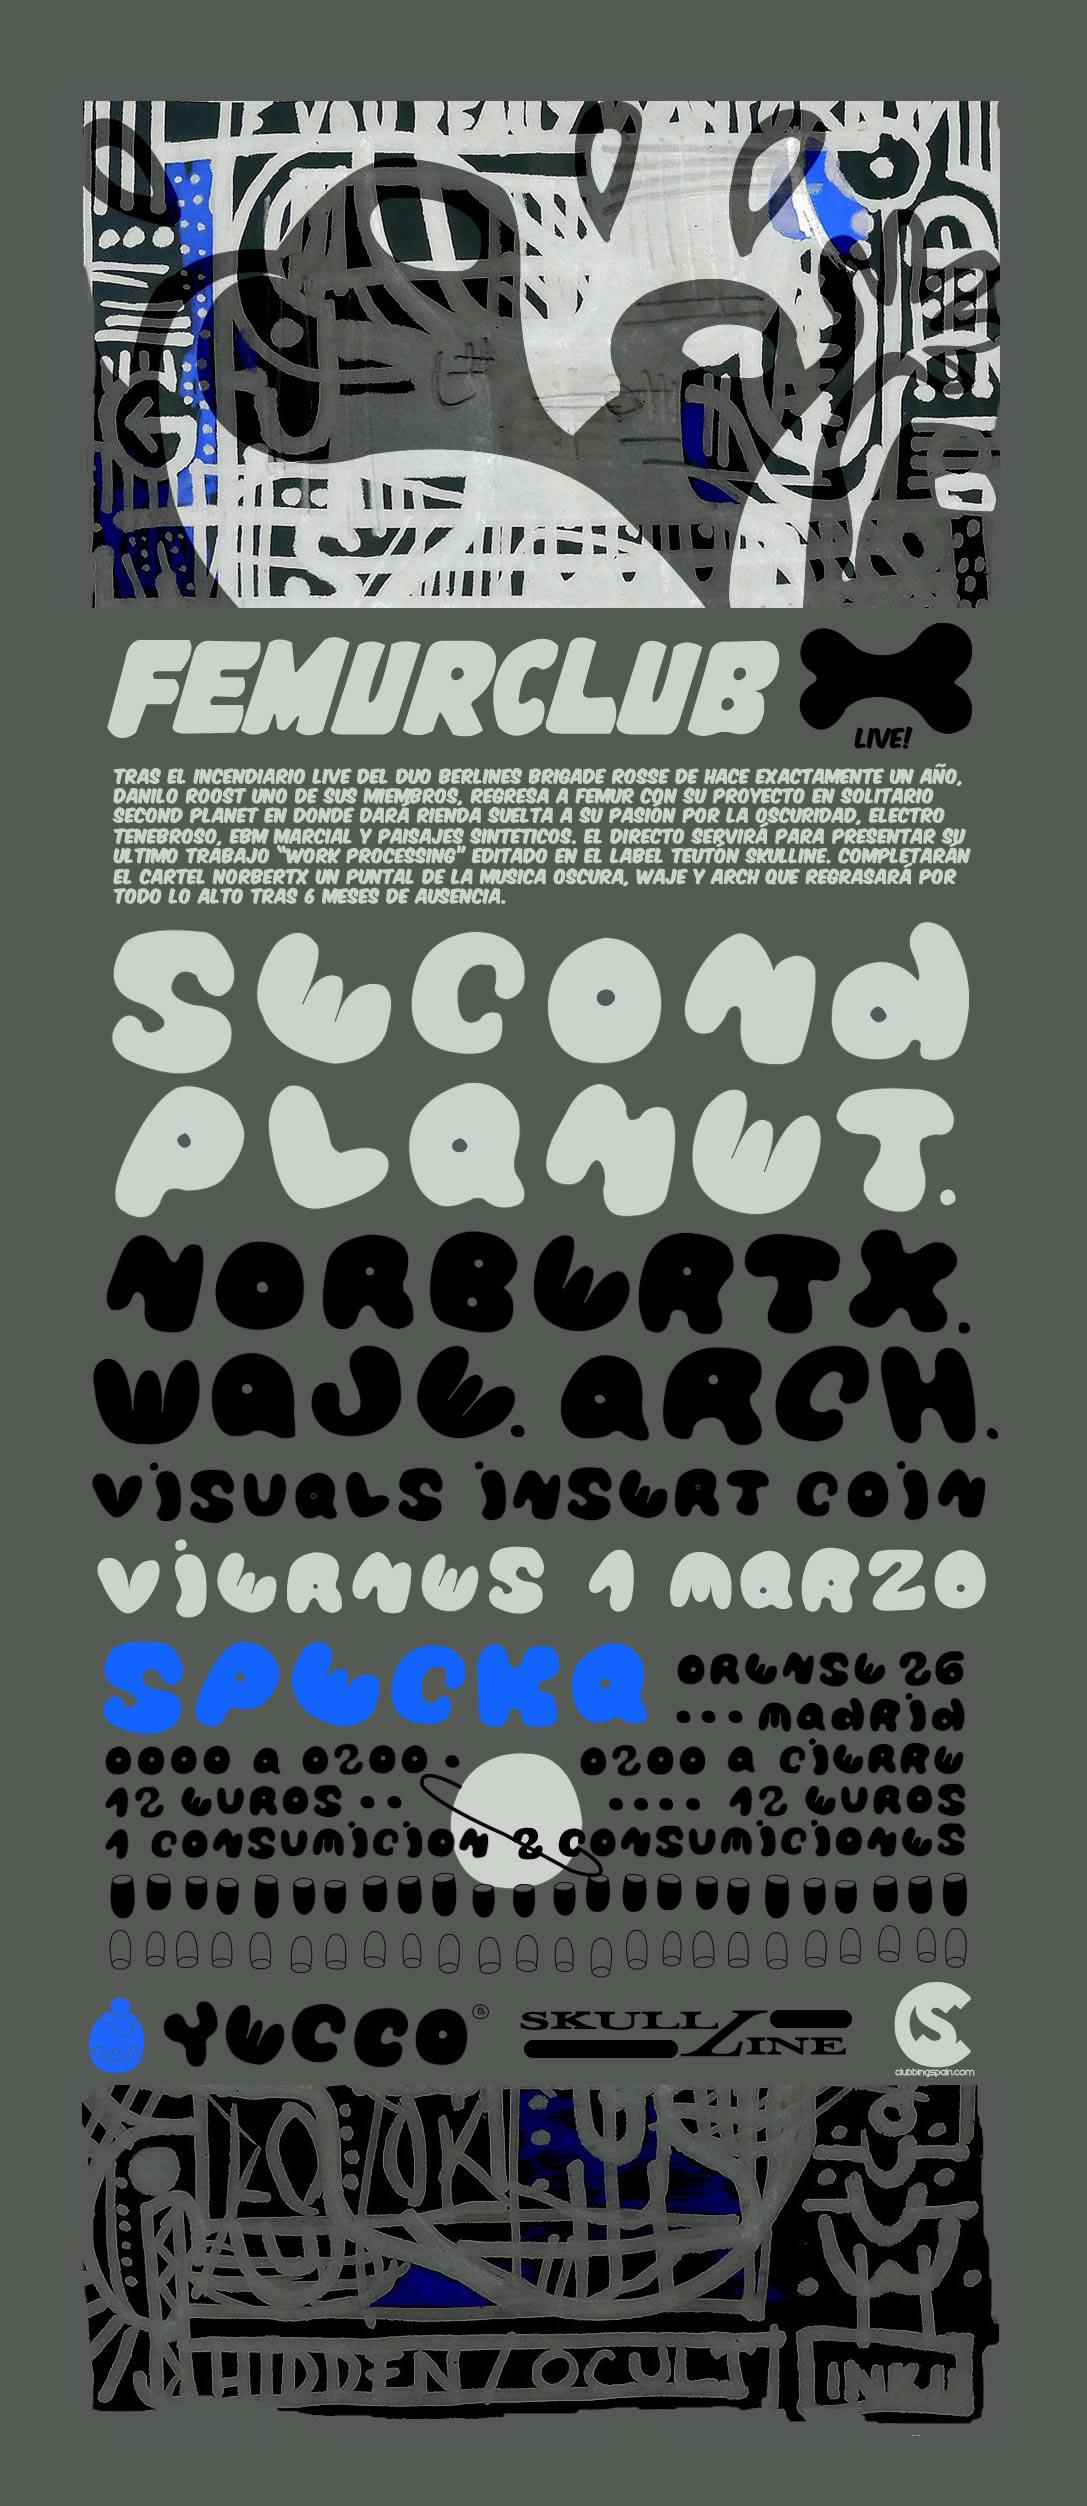 01.03.2013 SECOND PLANET LIVE @ FEMURCLUB Secondeventdefinitiv